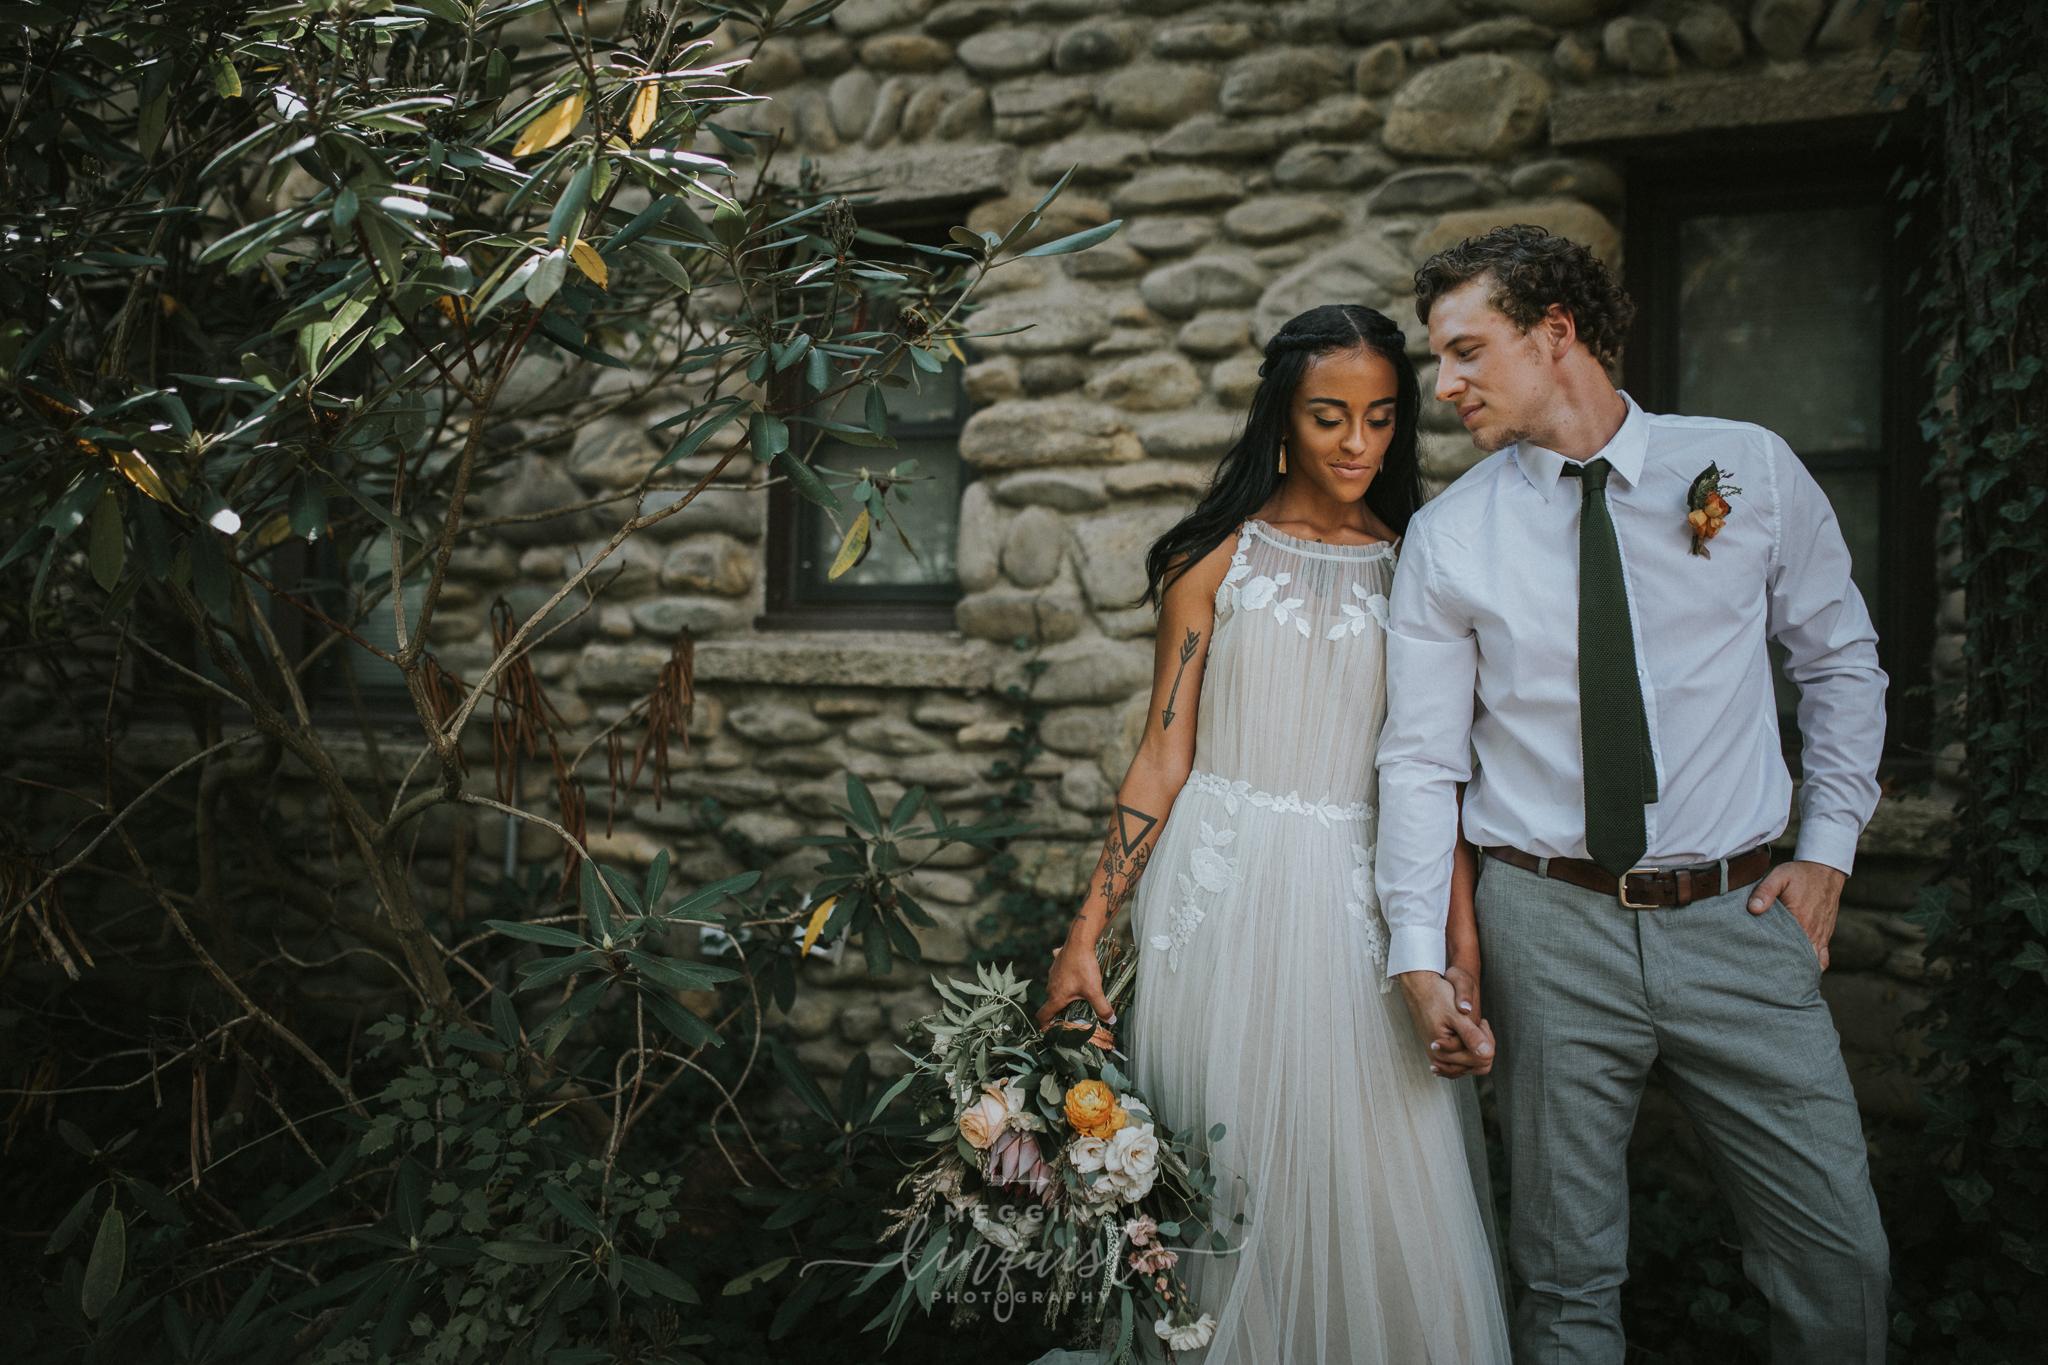 vintage-themed-wedding-reno-lake-tahoe-wedding-photographer-37.jpg